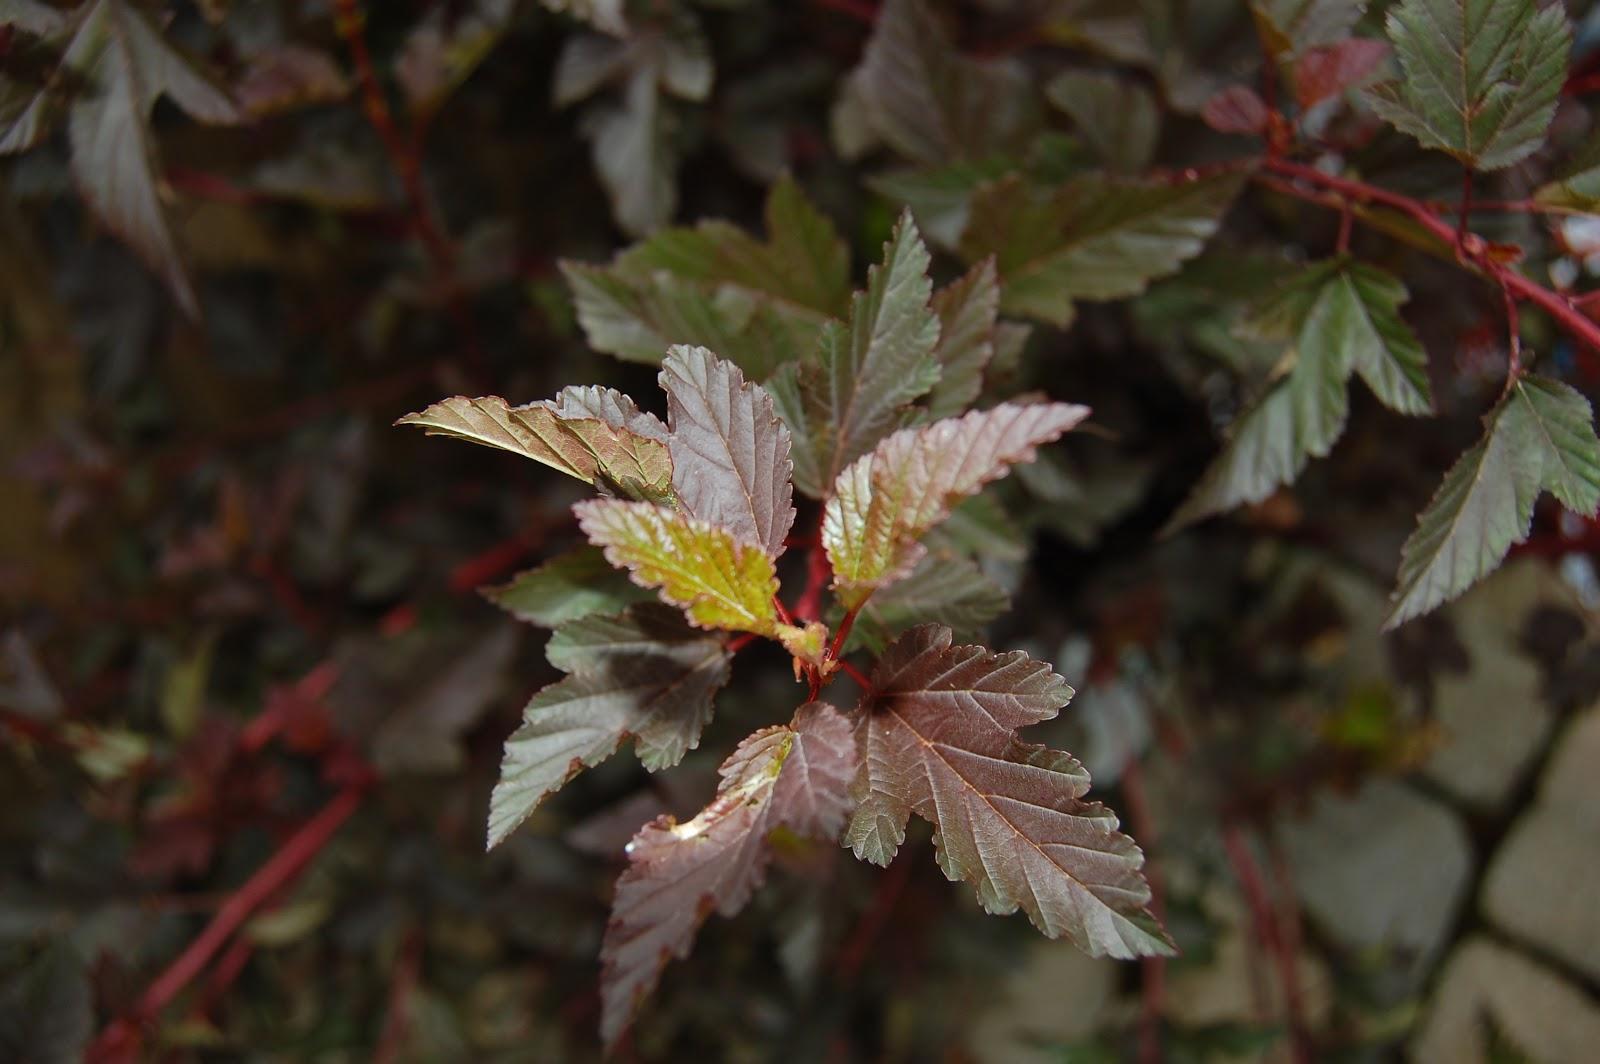 Plant Inventory at 20 Timothy : Physocarpus opulifolius / Ninebark